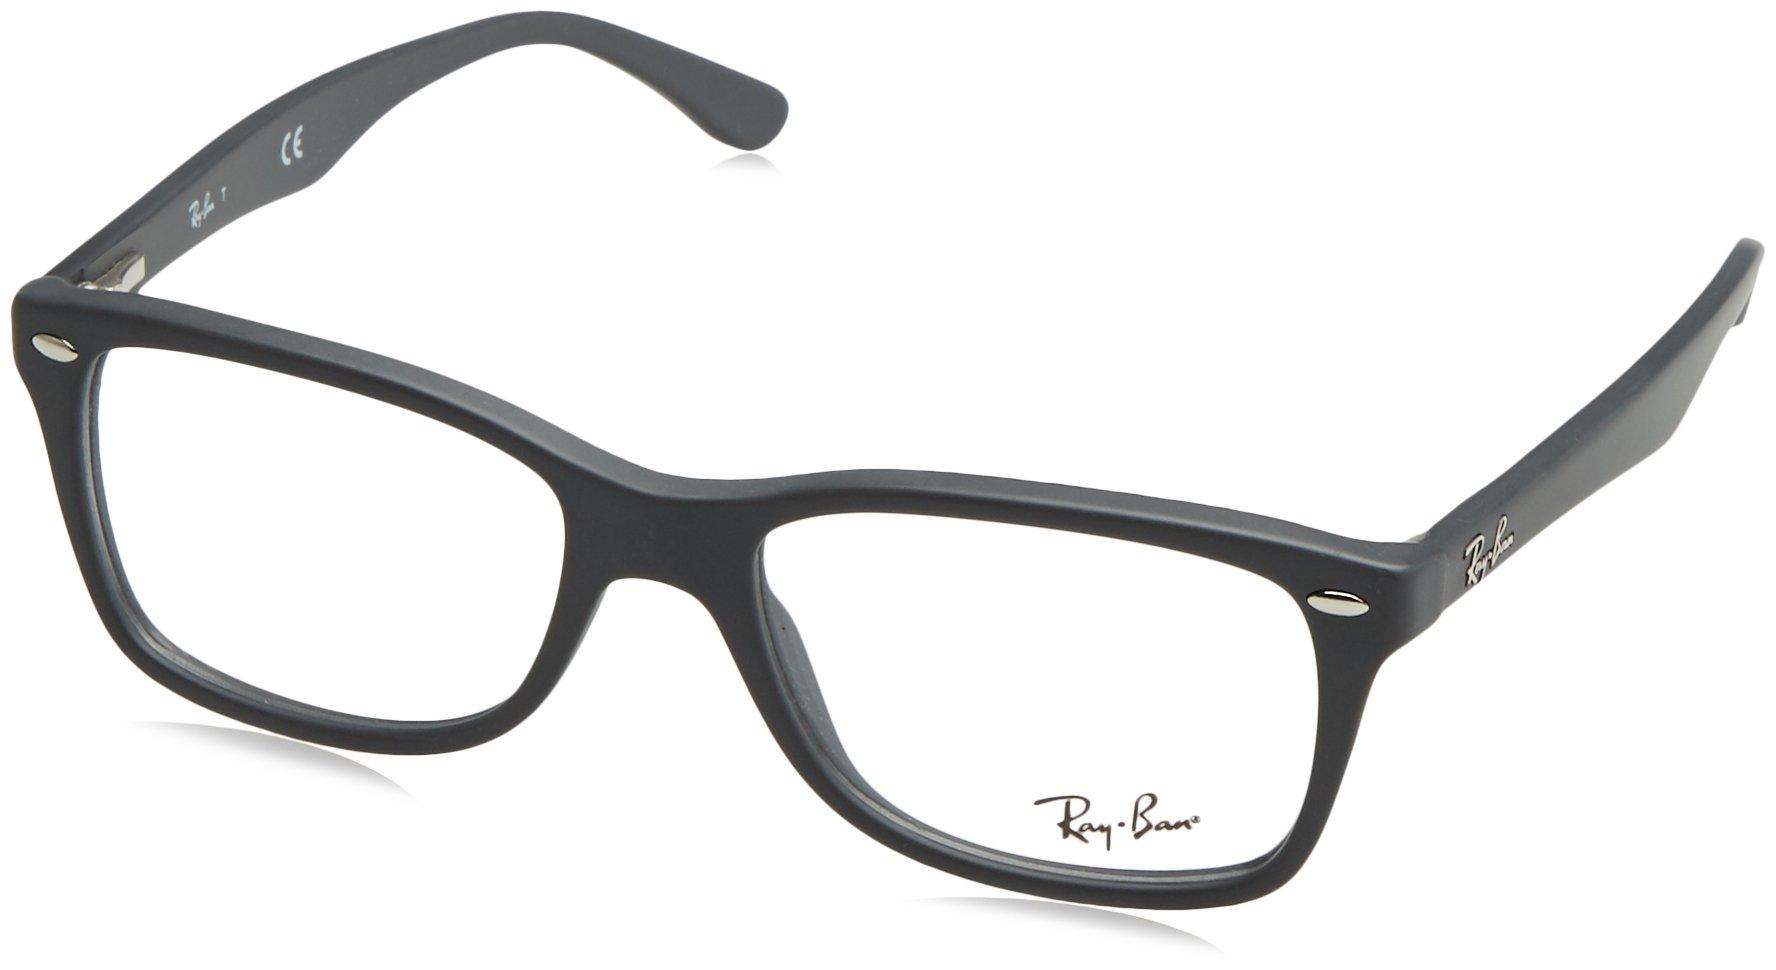 Ray-Ban Women's RX5228 Eyeglasses Sand Grey 53mm